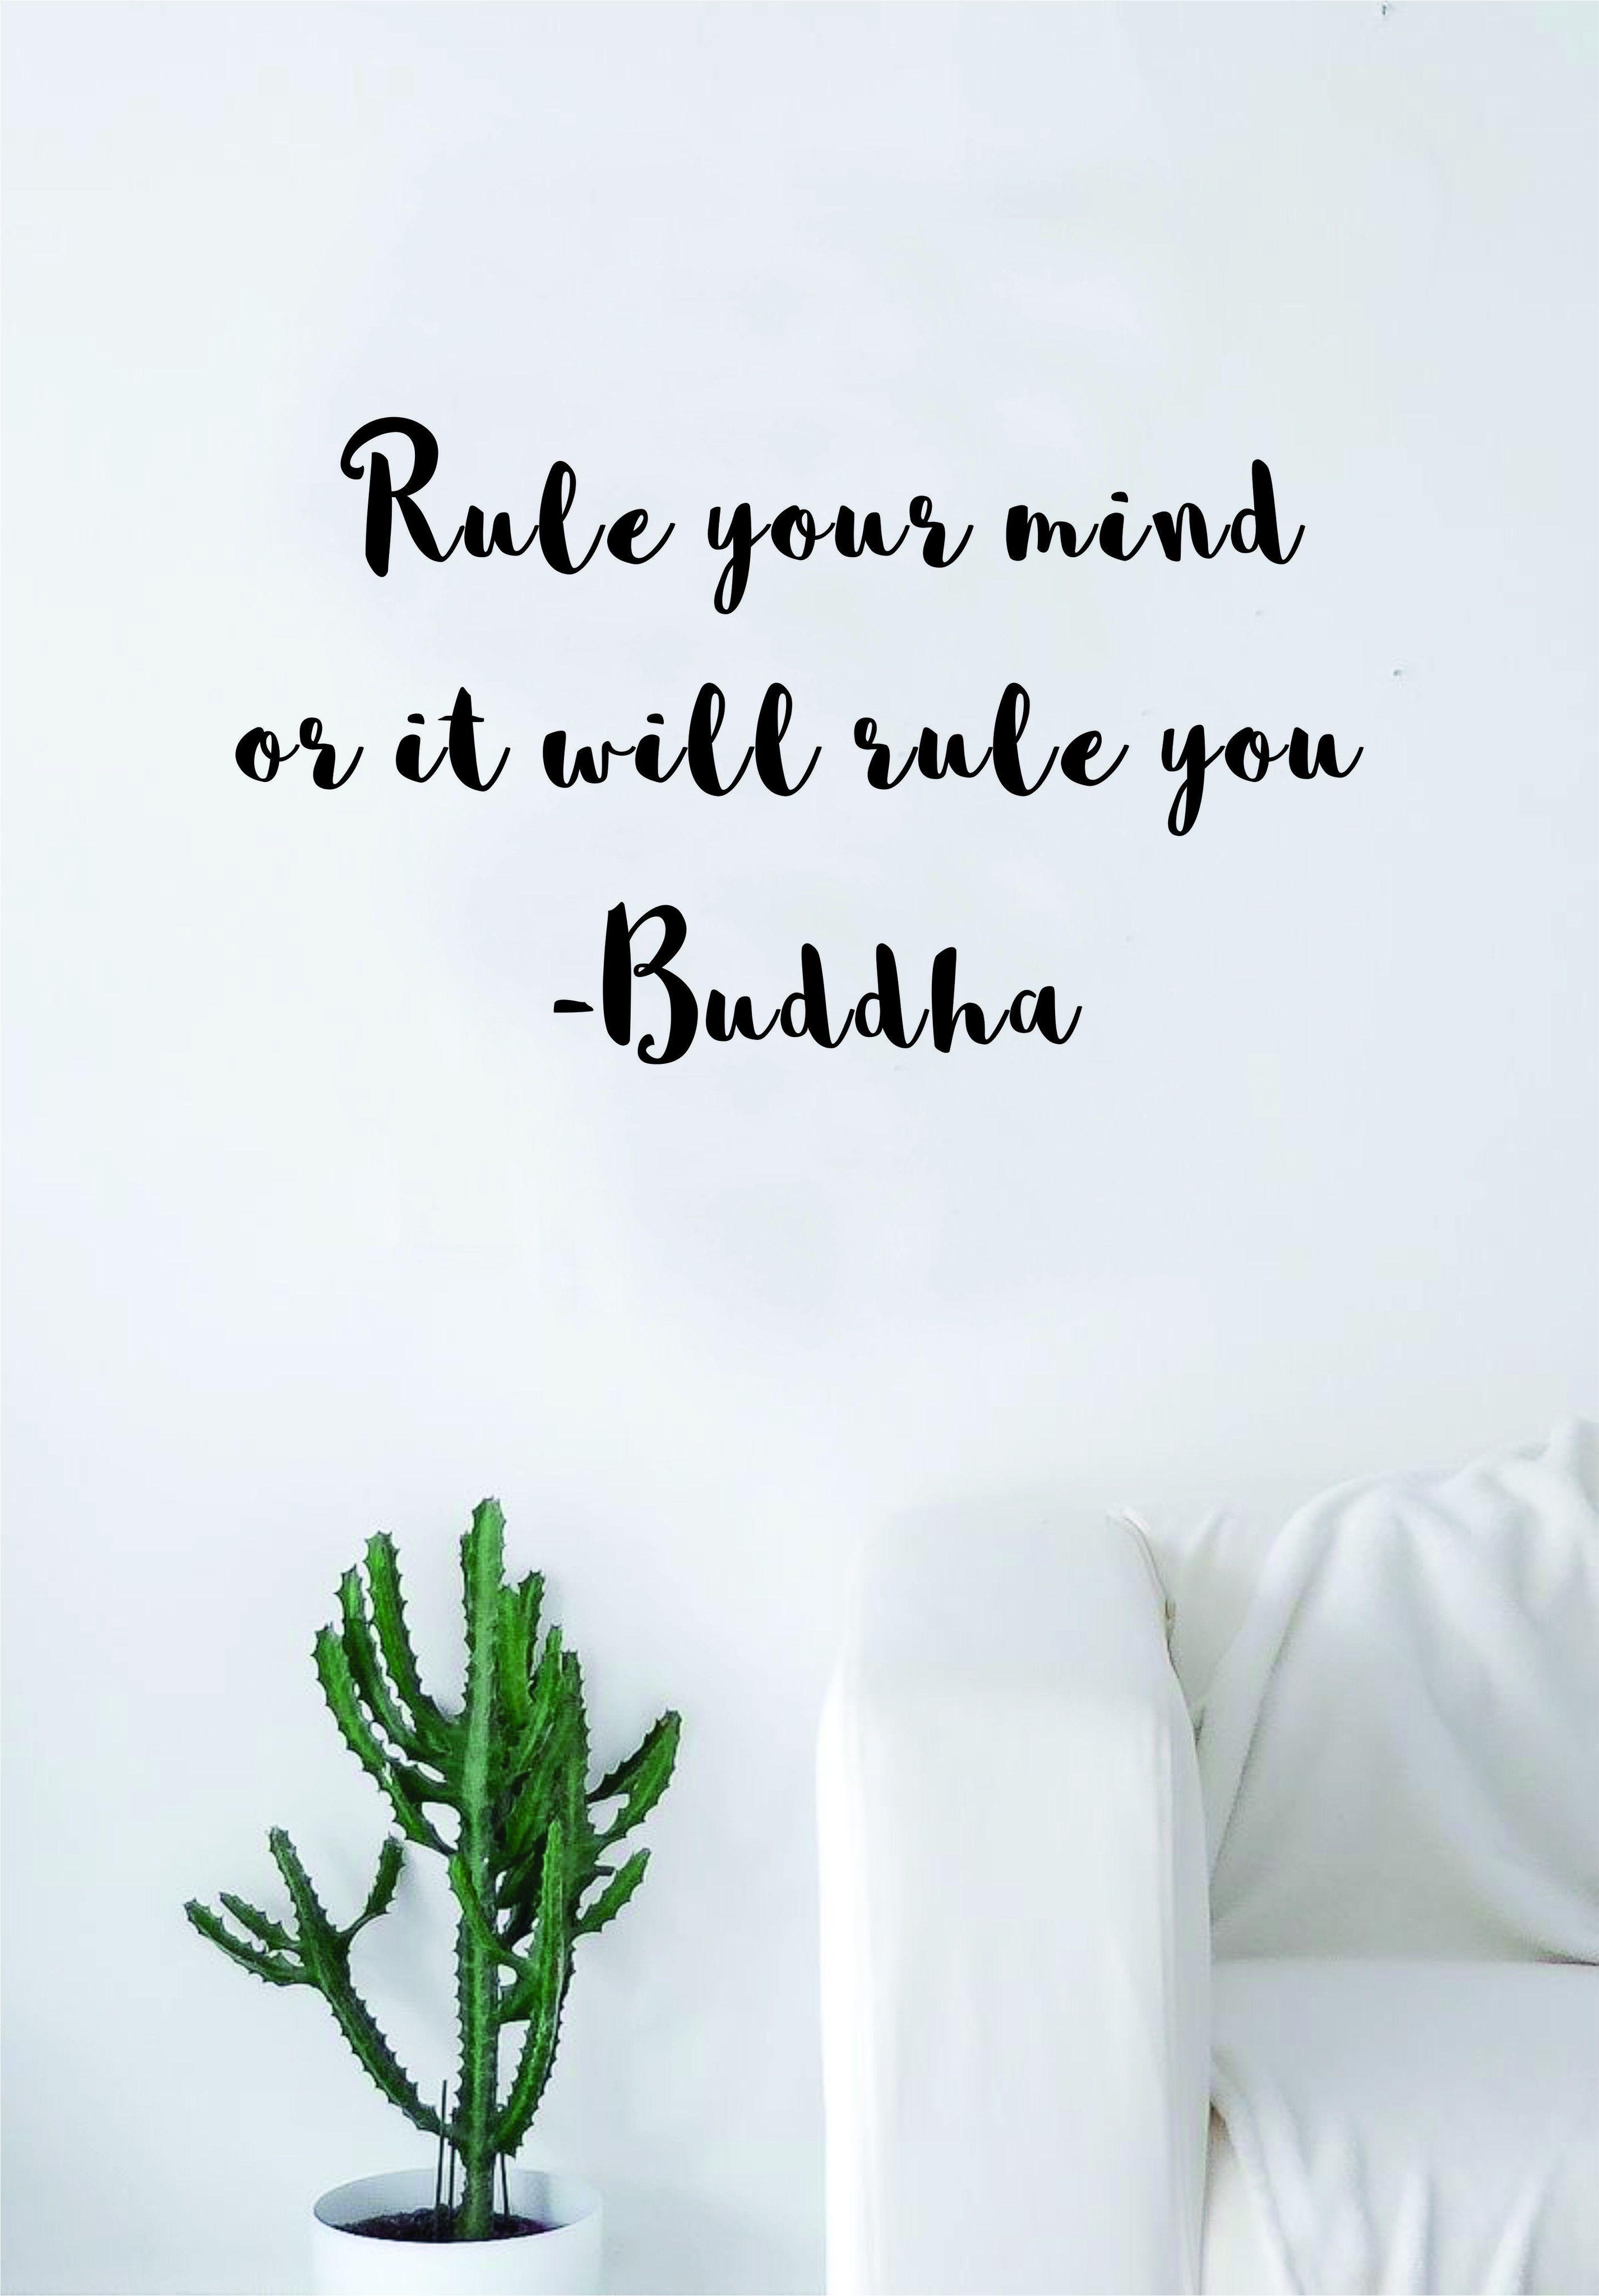 Rule Your Mind Wall Decal Sticker Room Art Vinyl Beautiful Yoga Hamsa Namaste Lotus Meditate Buddha Peaceful Love Inspirational - gold